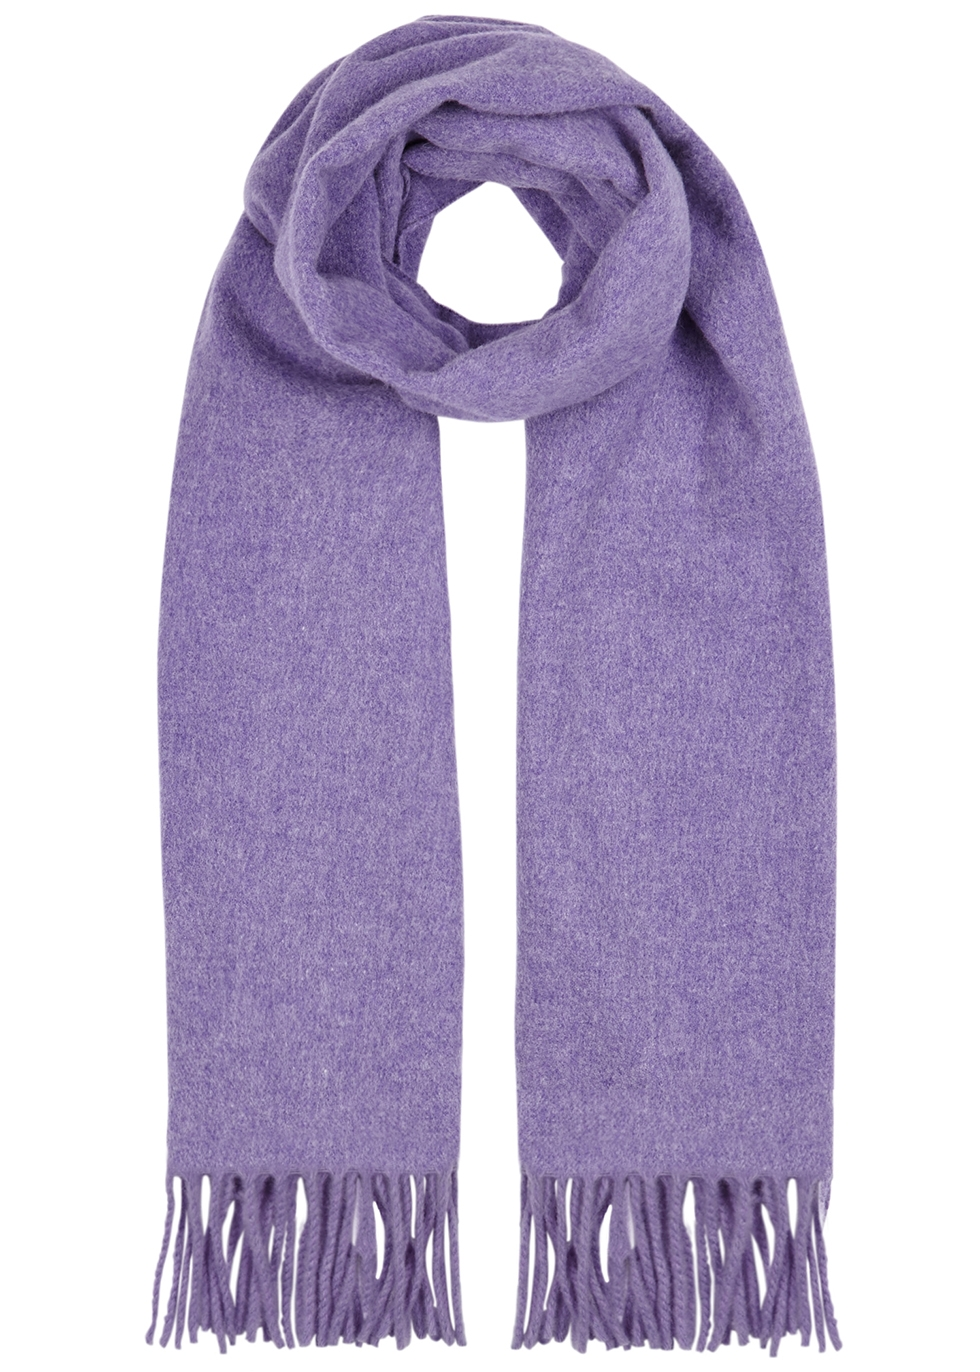 Canada lilac mélange wool scarf - Acne Studios